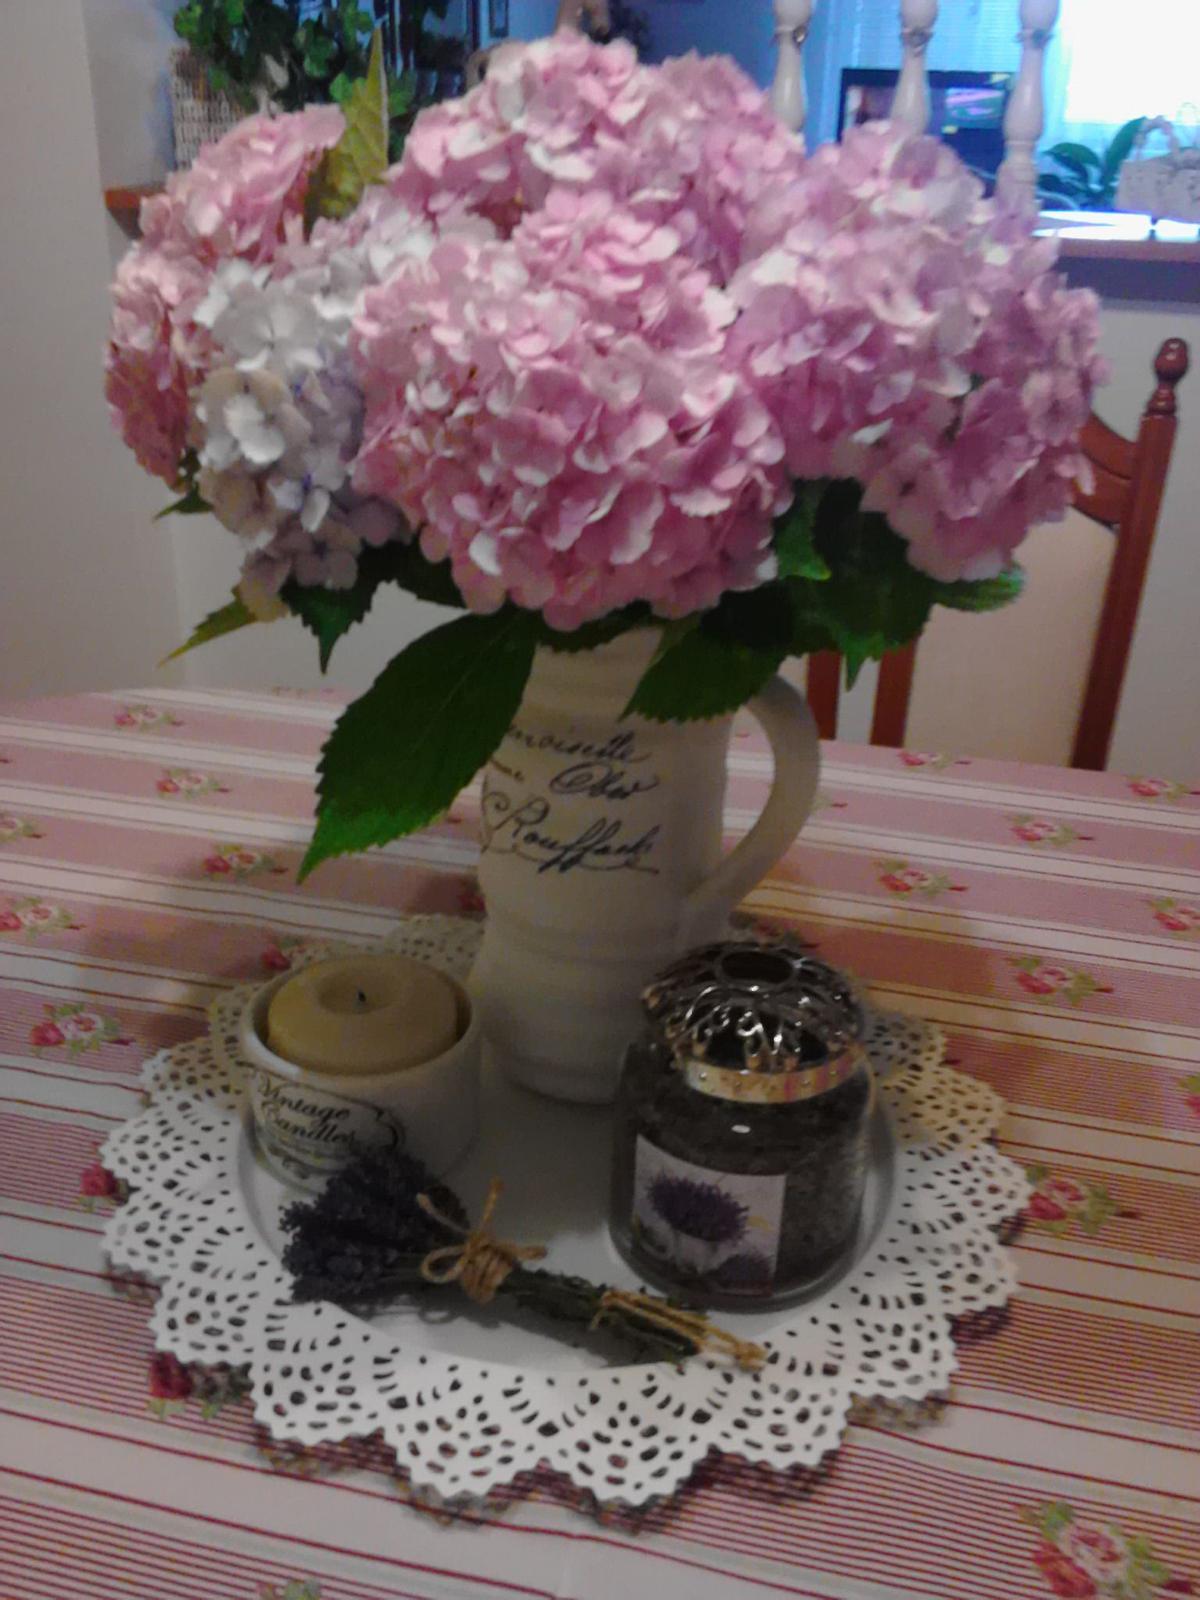 Moje male radosti - Dnes som dostala tuto krasnu kyticu hortenzii, velmi sa im tesim